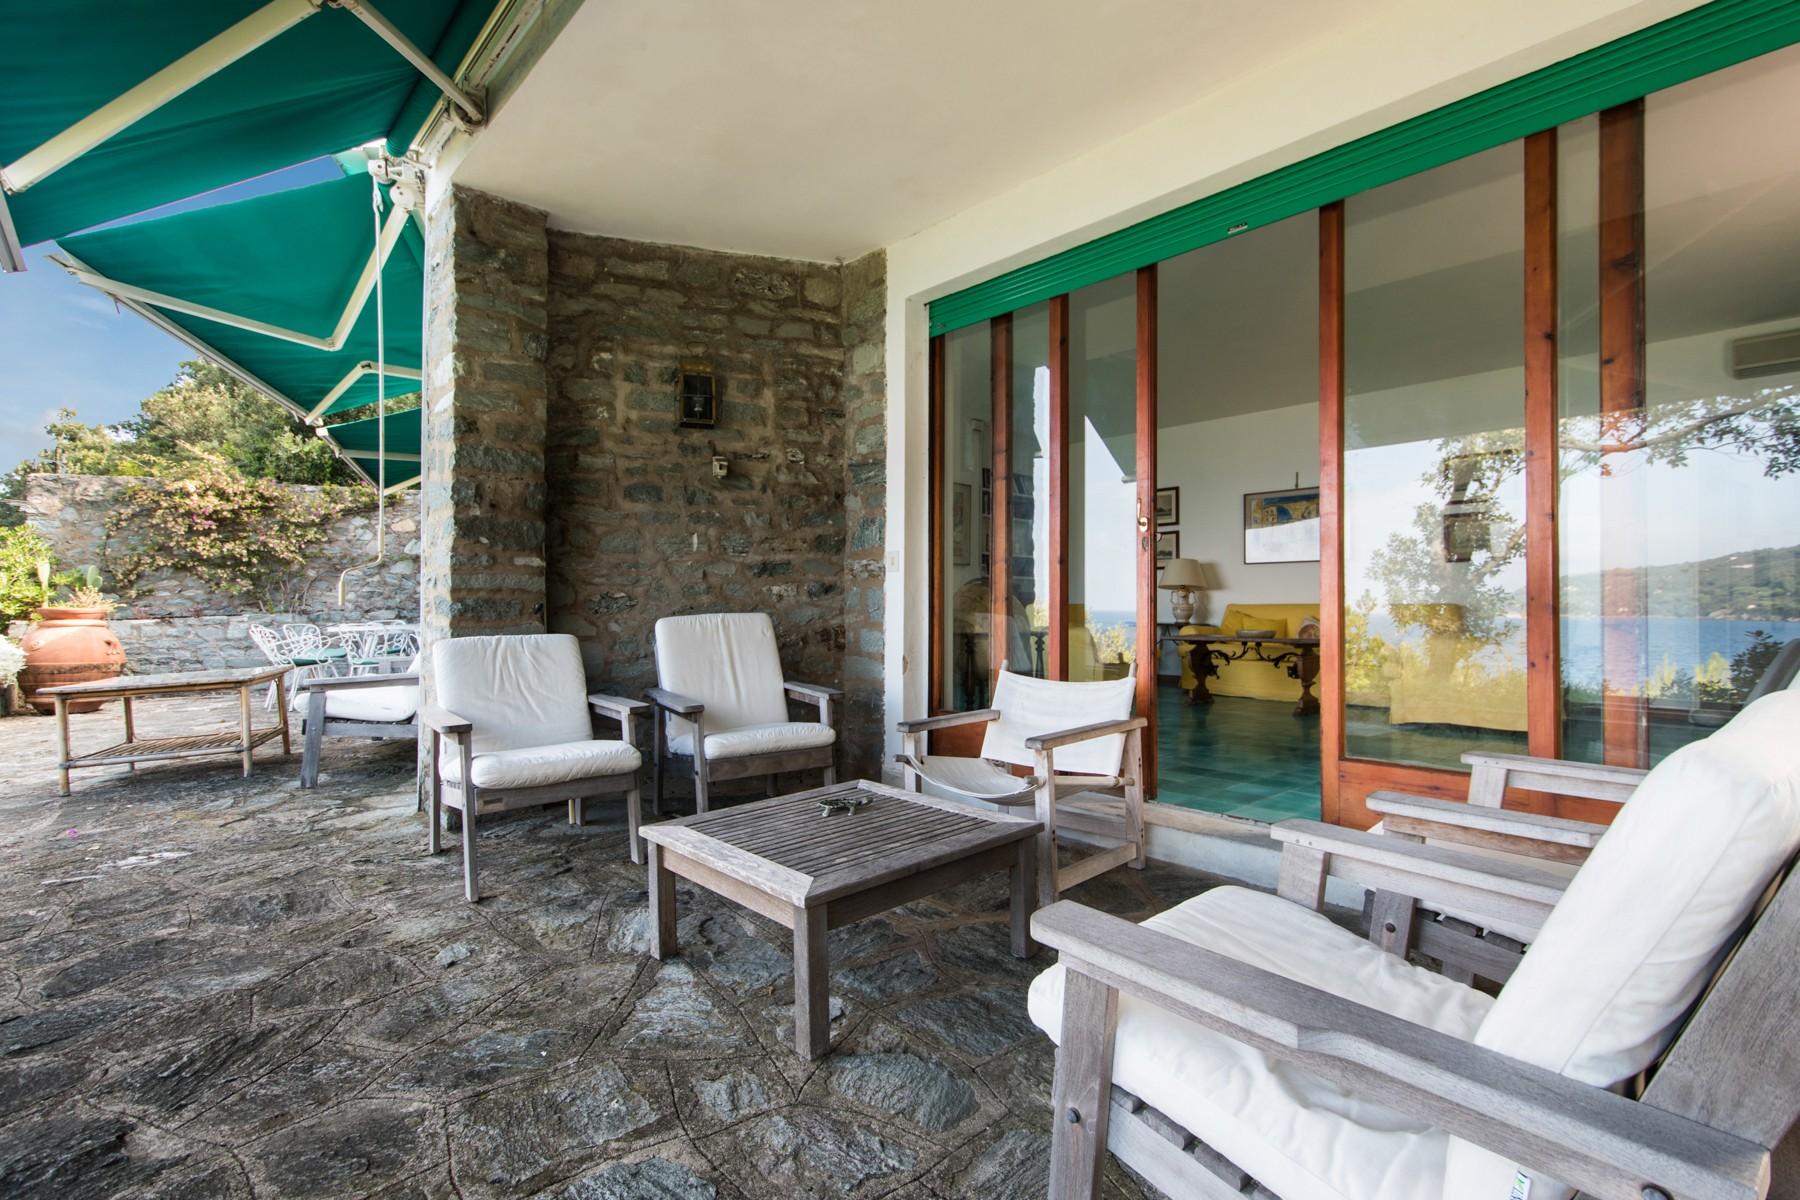 Villa in Vendita a Marciana: 5 locali, 300 mq - Foto 5